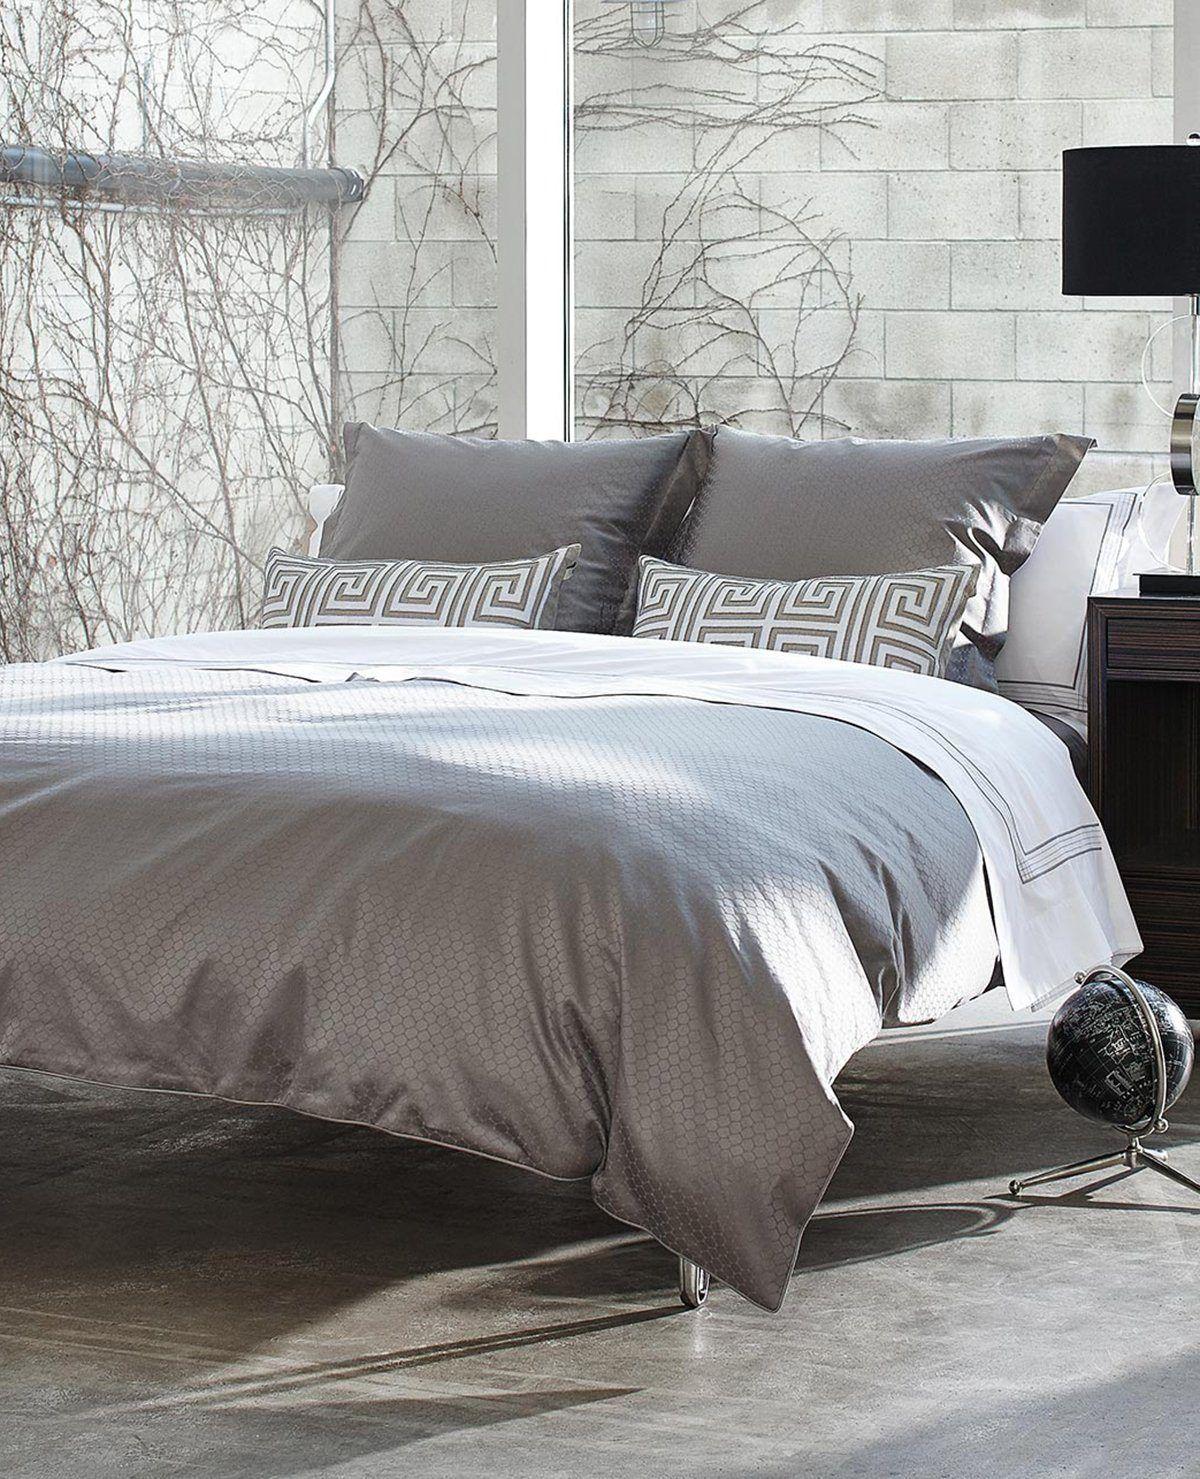 Contemporary Smoke Modern Bedroom Design Modern Bedroom Industrial Modern Bedroom